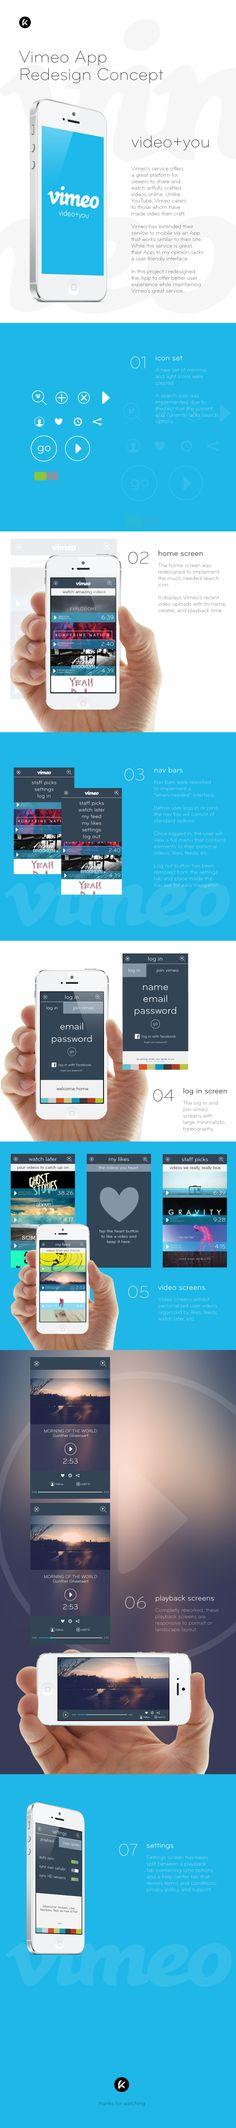 Vimeo App Redesign Concept by Karielys Cruz, via Behance  Love horizontal structure ! #web #Ui